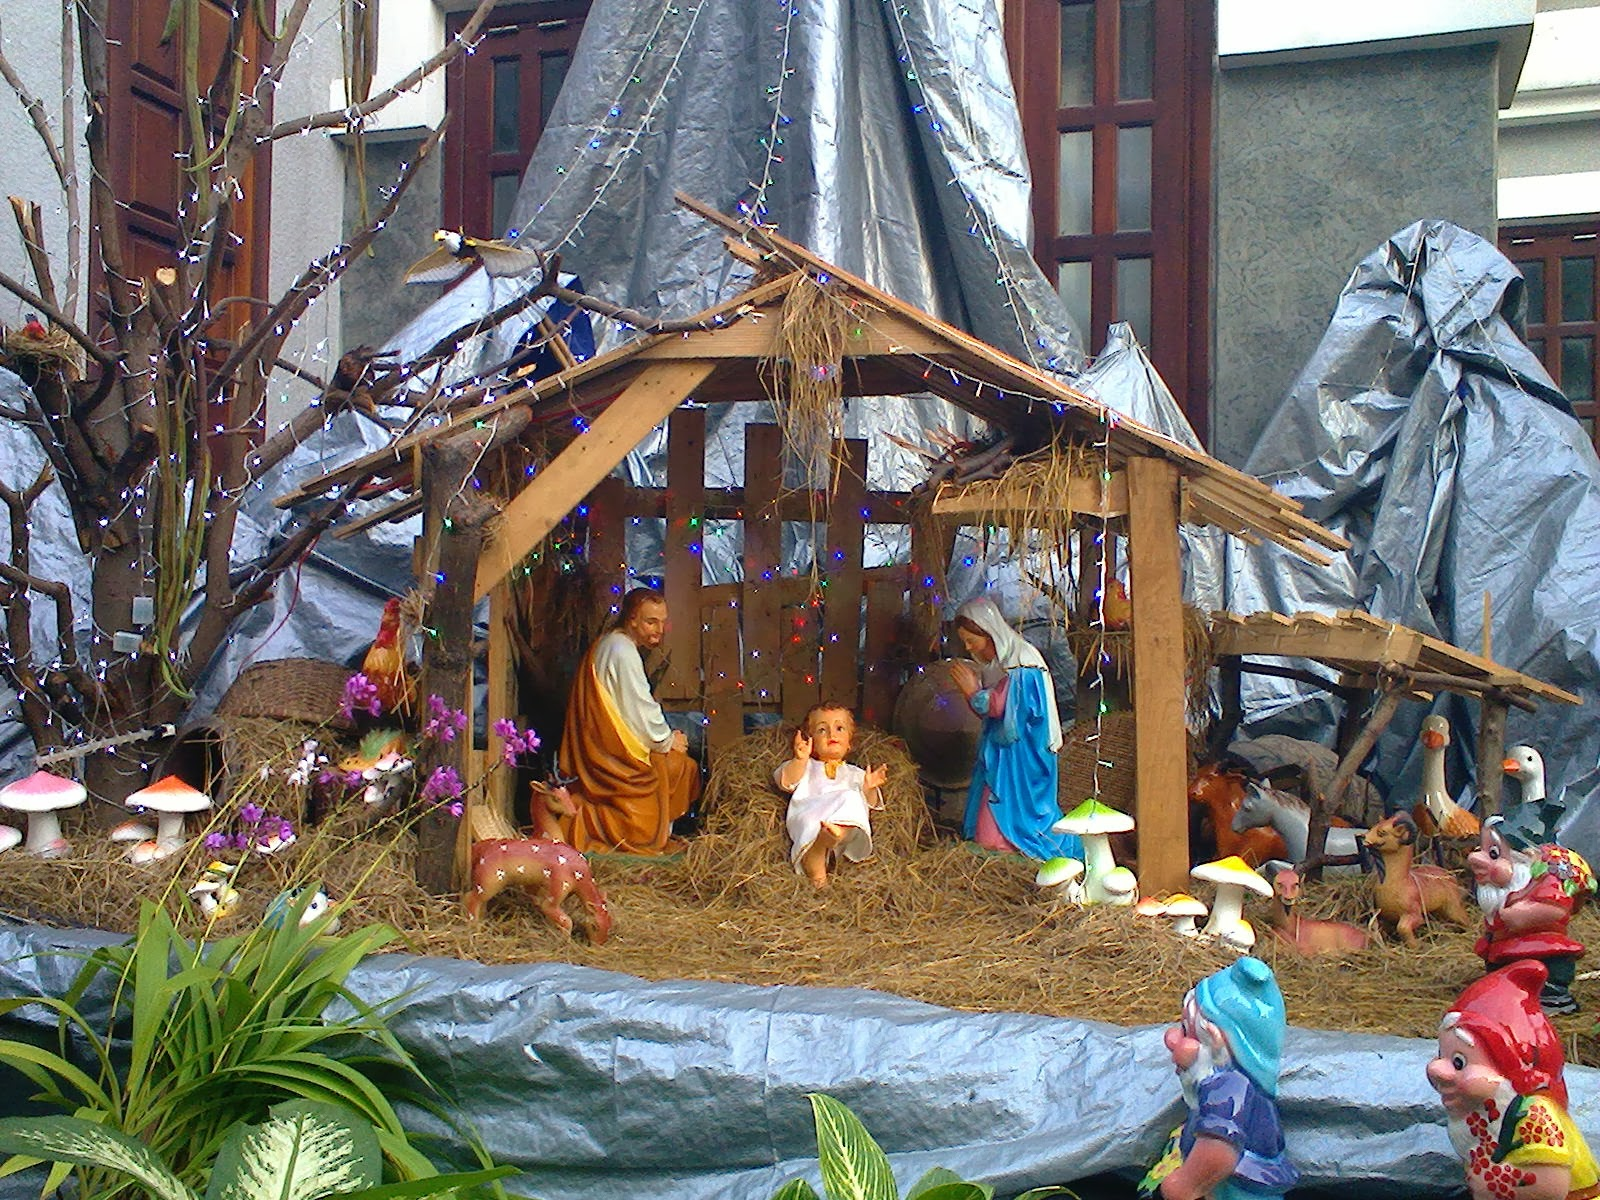 nativity sets for sale , christmas crib photos , christmas nativity set , manger scene 2019